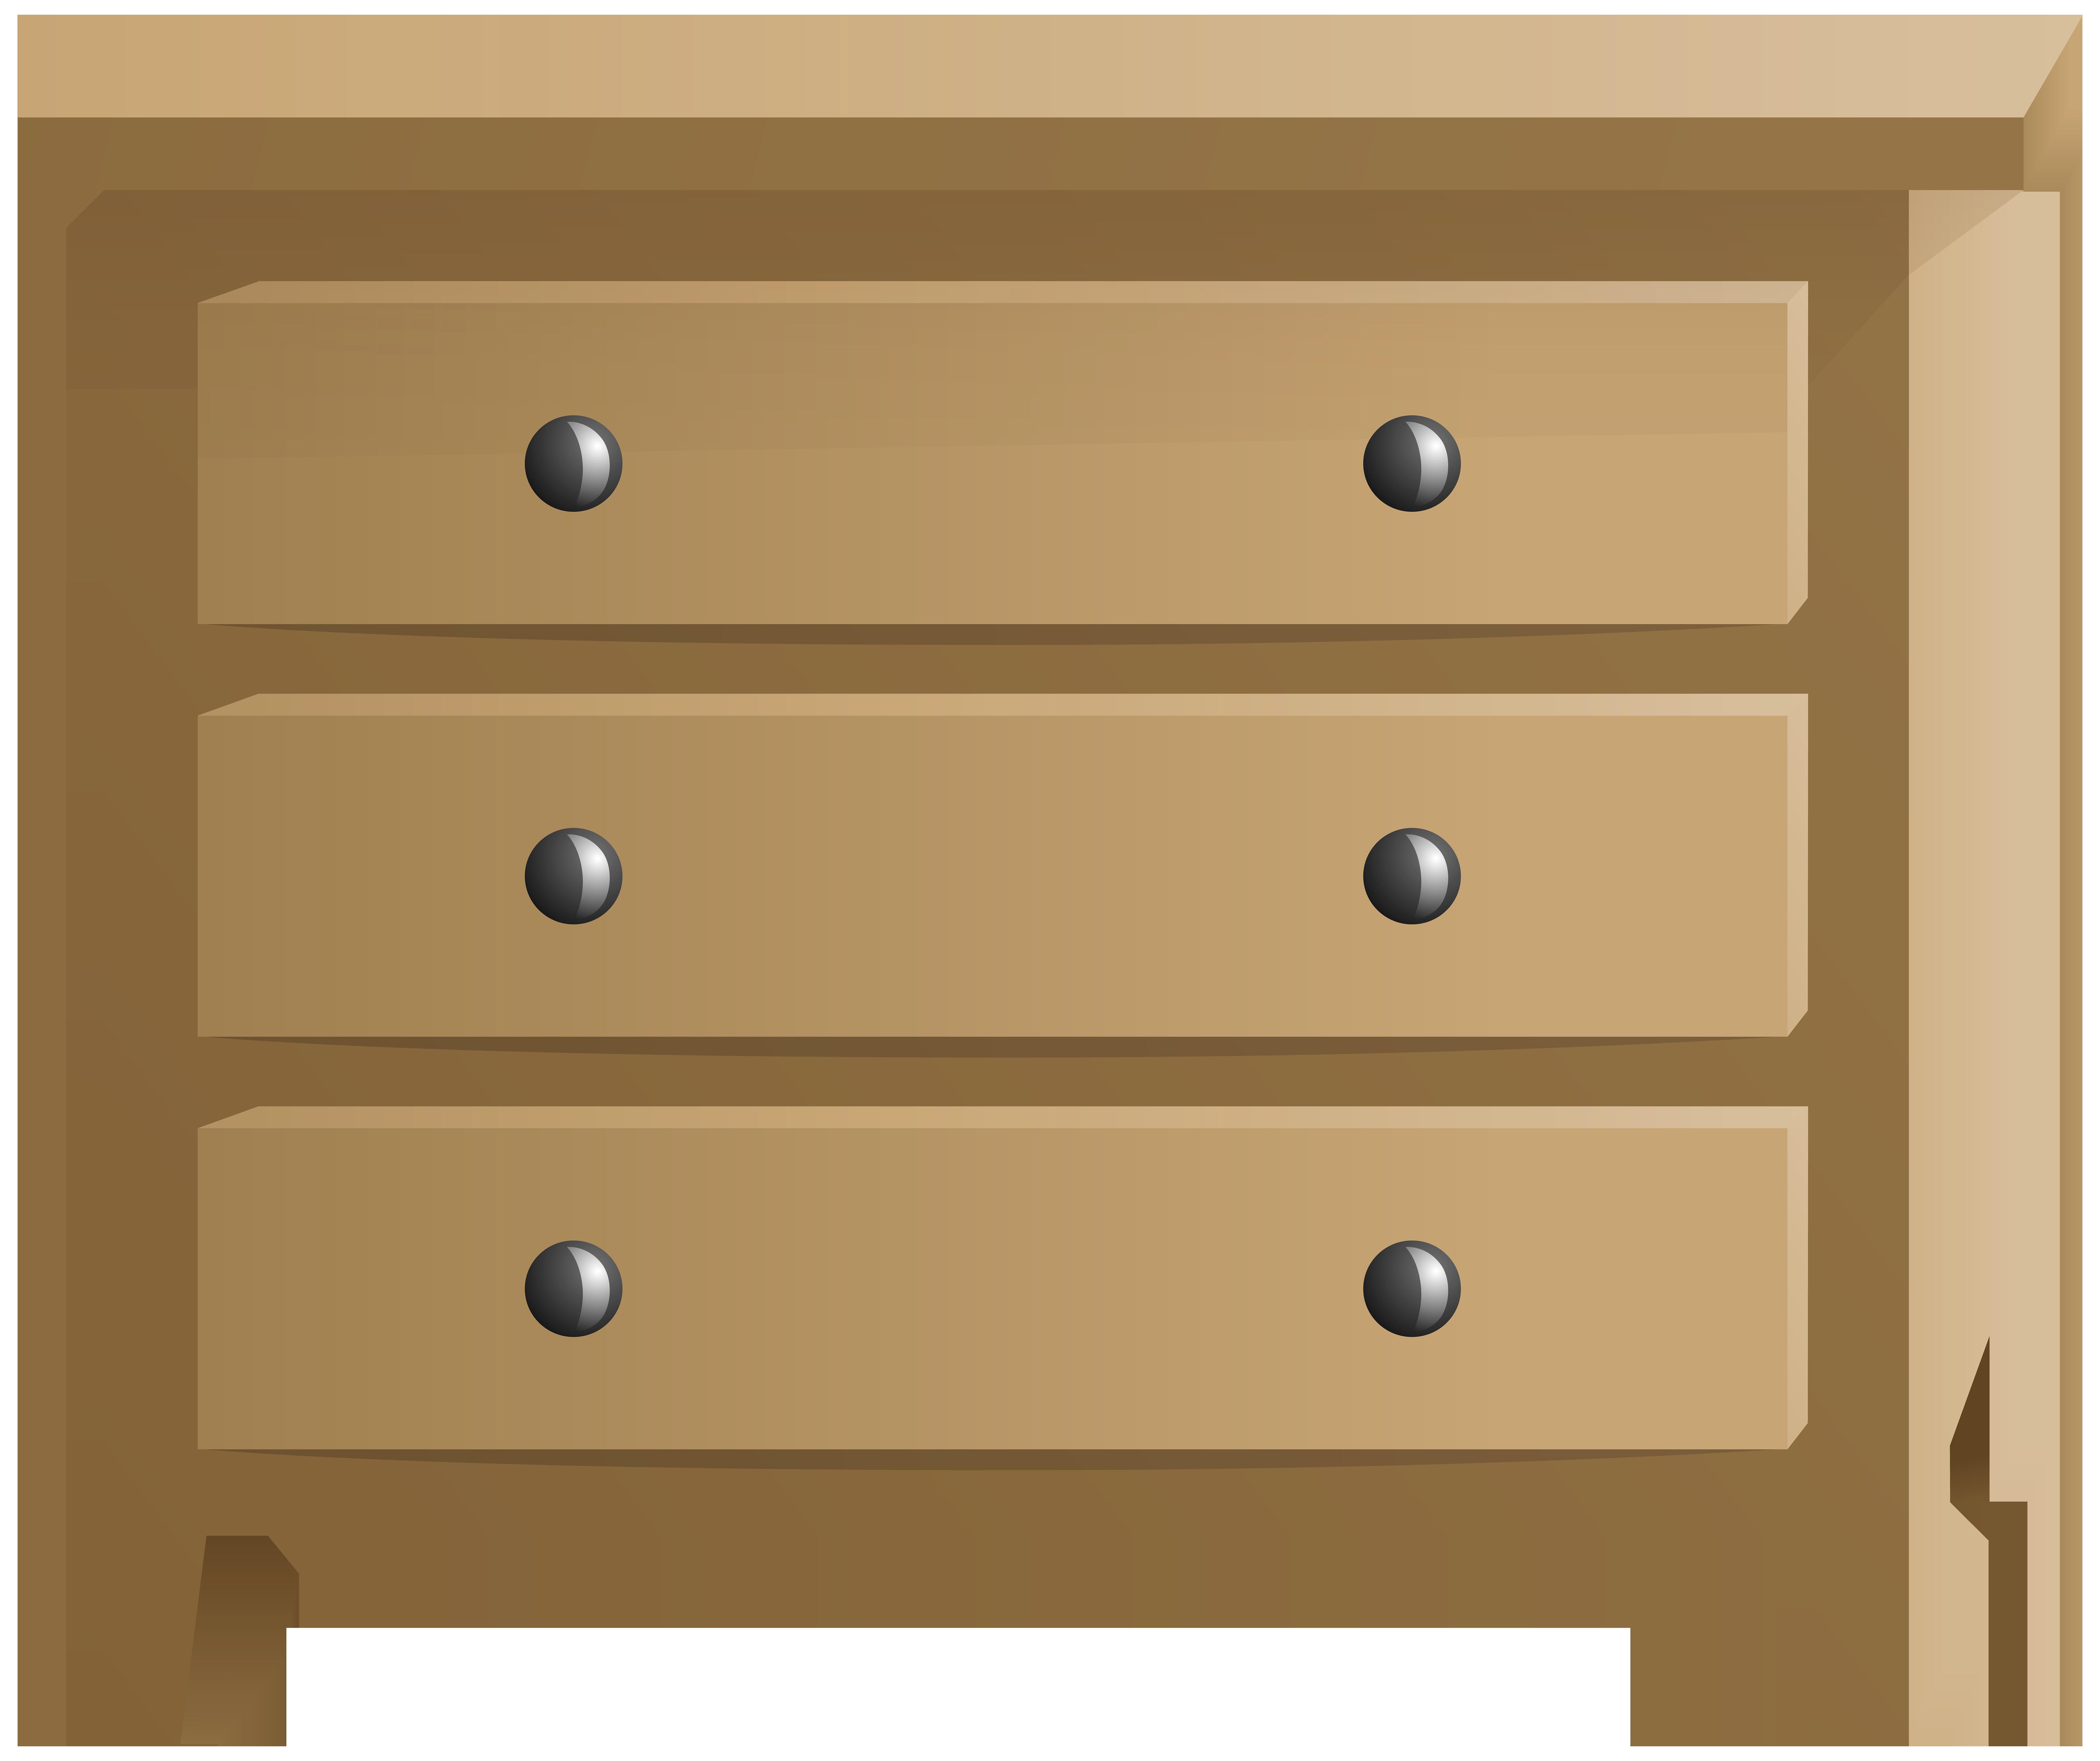 Wooden Commode Transparent PNG Clip Art Image.